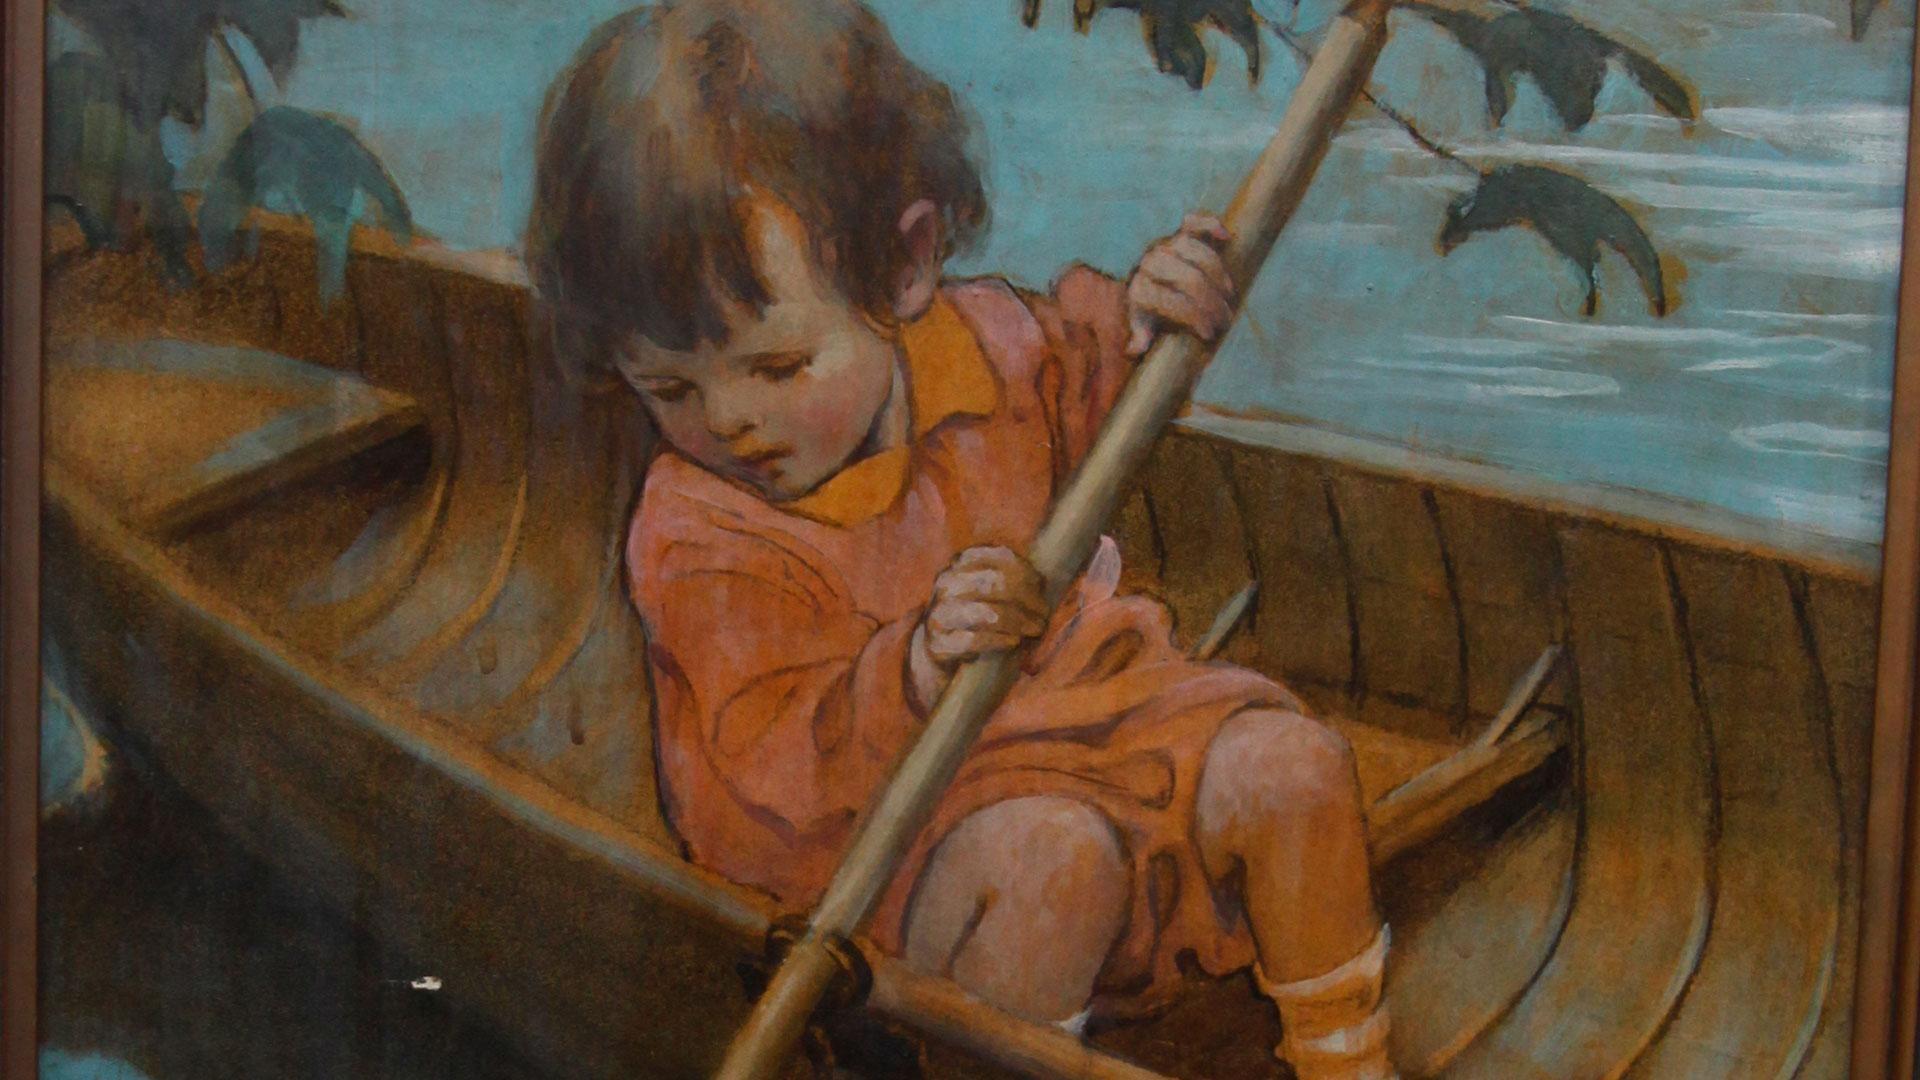 Jessie Willcox Smith (1863 - 1935, American) | Childrens